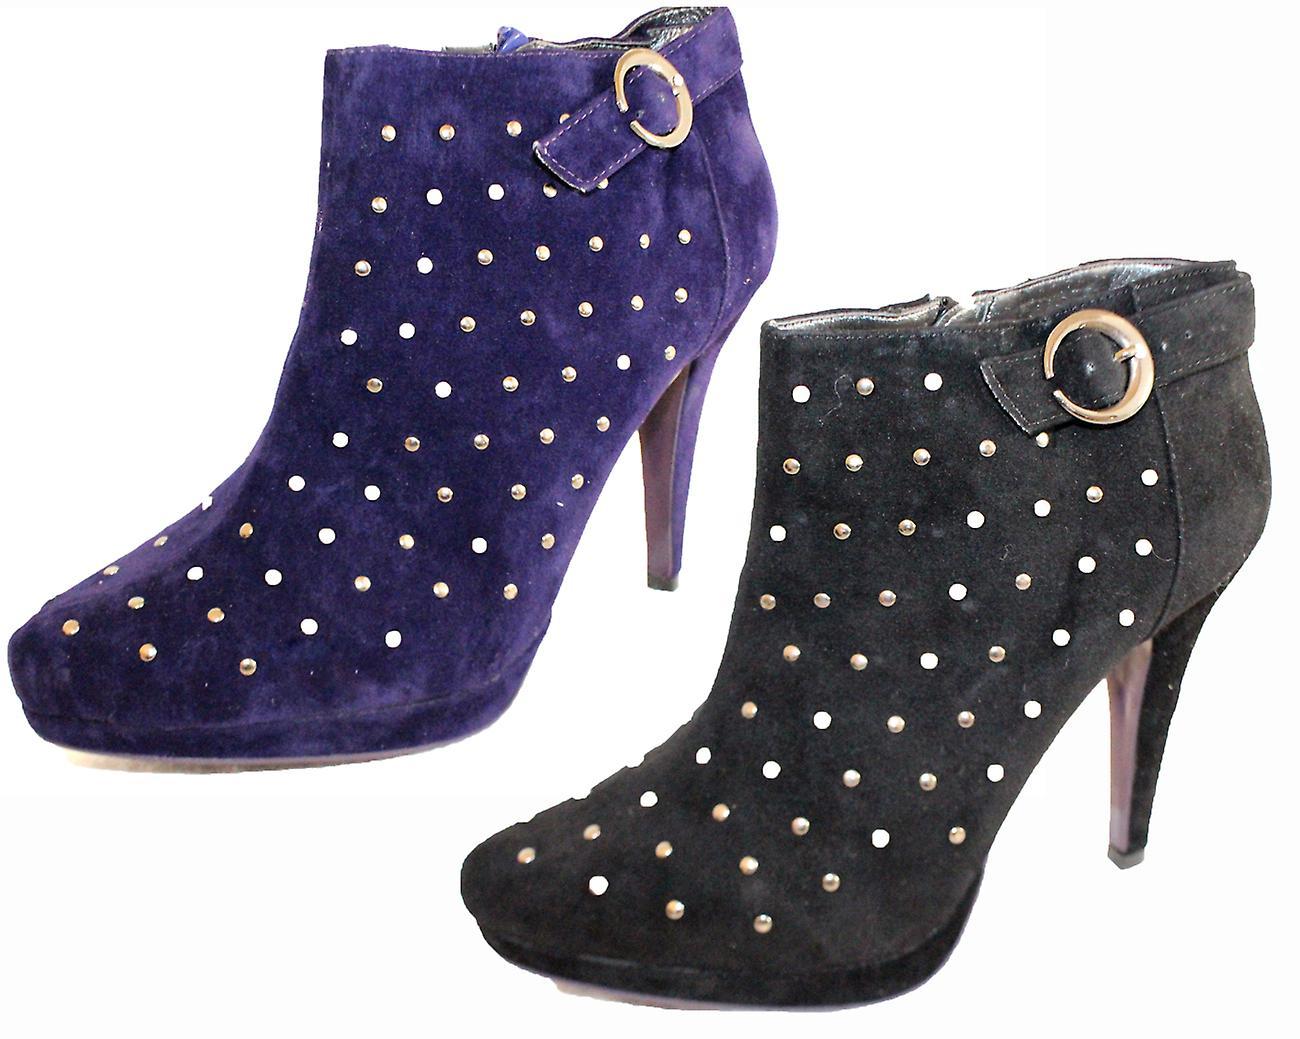 Rascal Faux Suede Spotty Stud Shoe Boots FMbHi